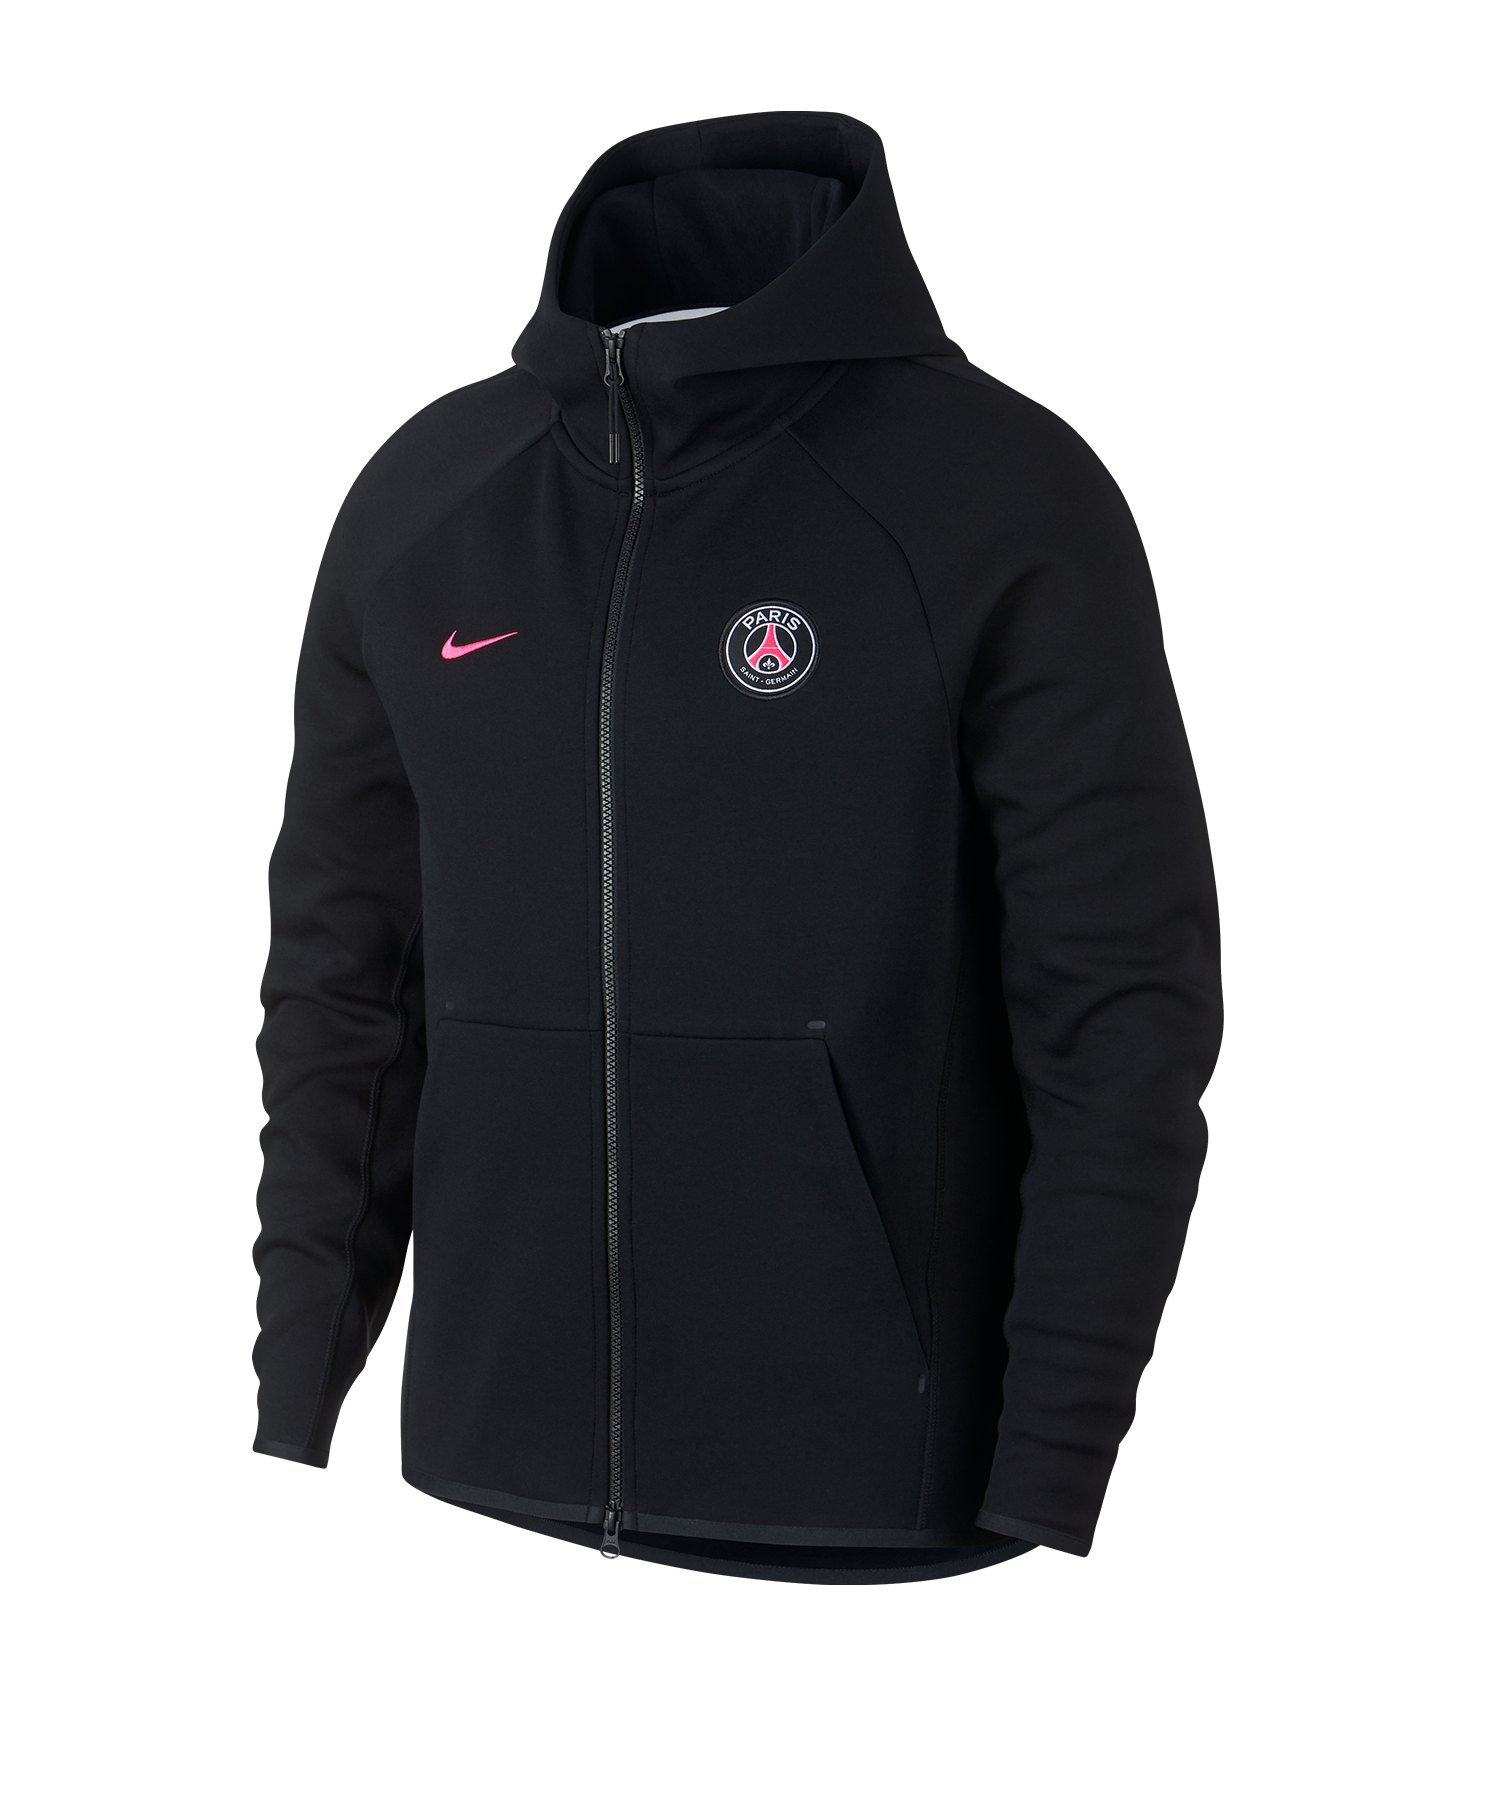 brand new 3d4e7 f3404 Nike Paris Saint Germain Tech Fleece Jacke F010 - schwarz